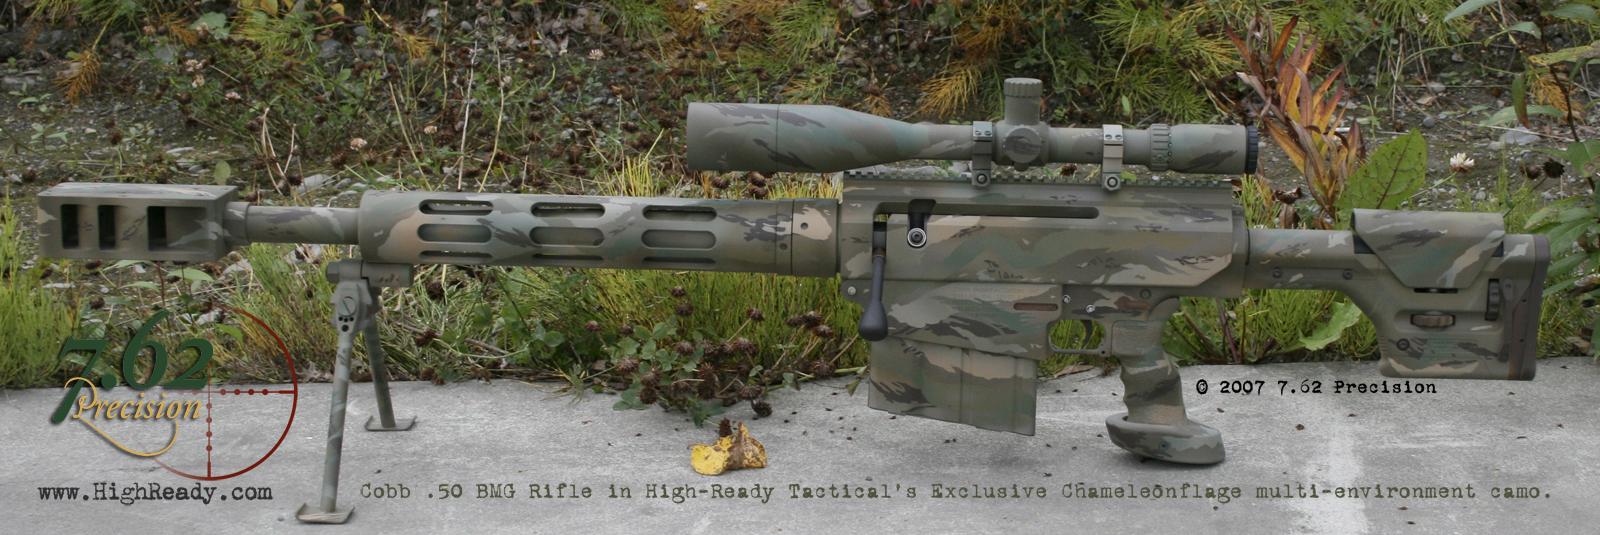 Cobb .50 BMG rifle in Chameleonflage Tigerstripe